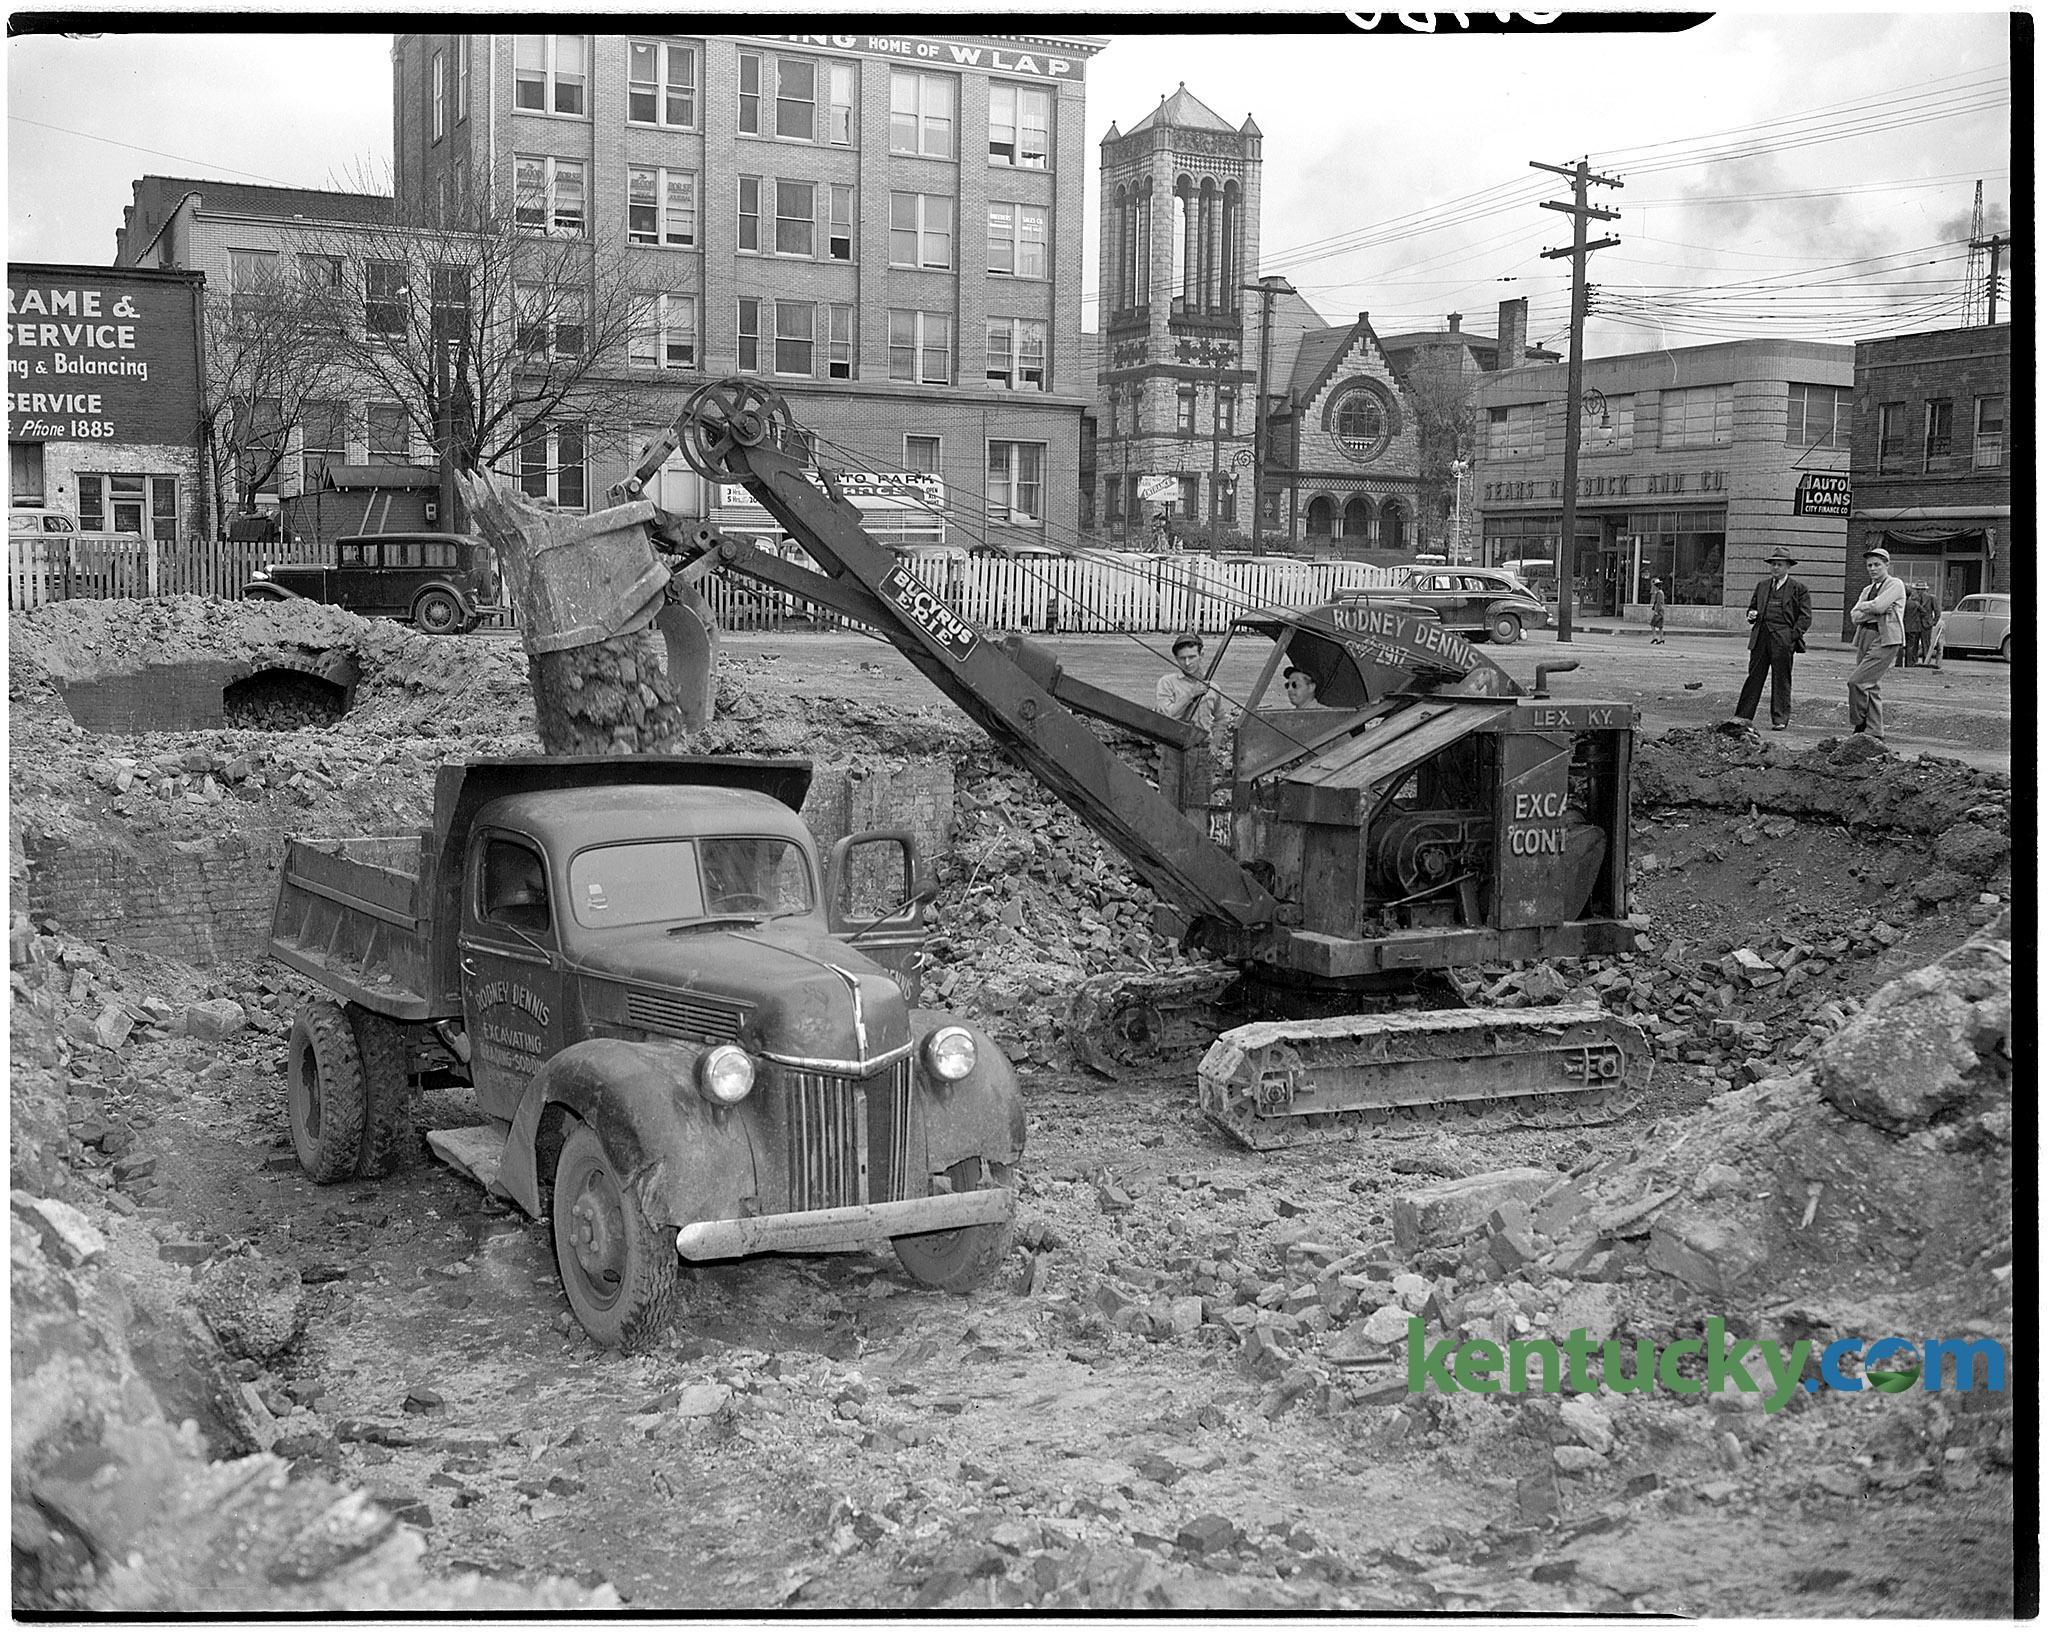 Excavation site in downtown Lexington, 1946 | Kentucky Photo Archive